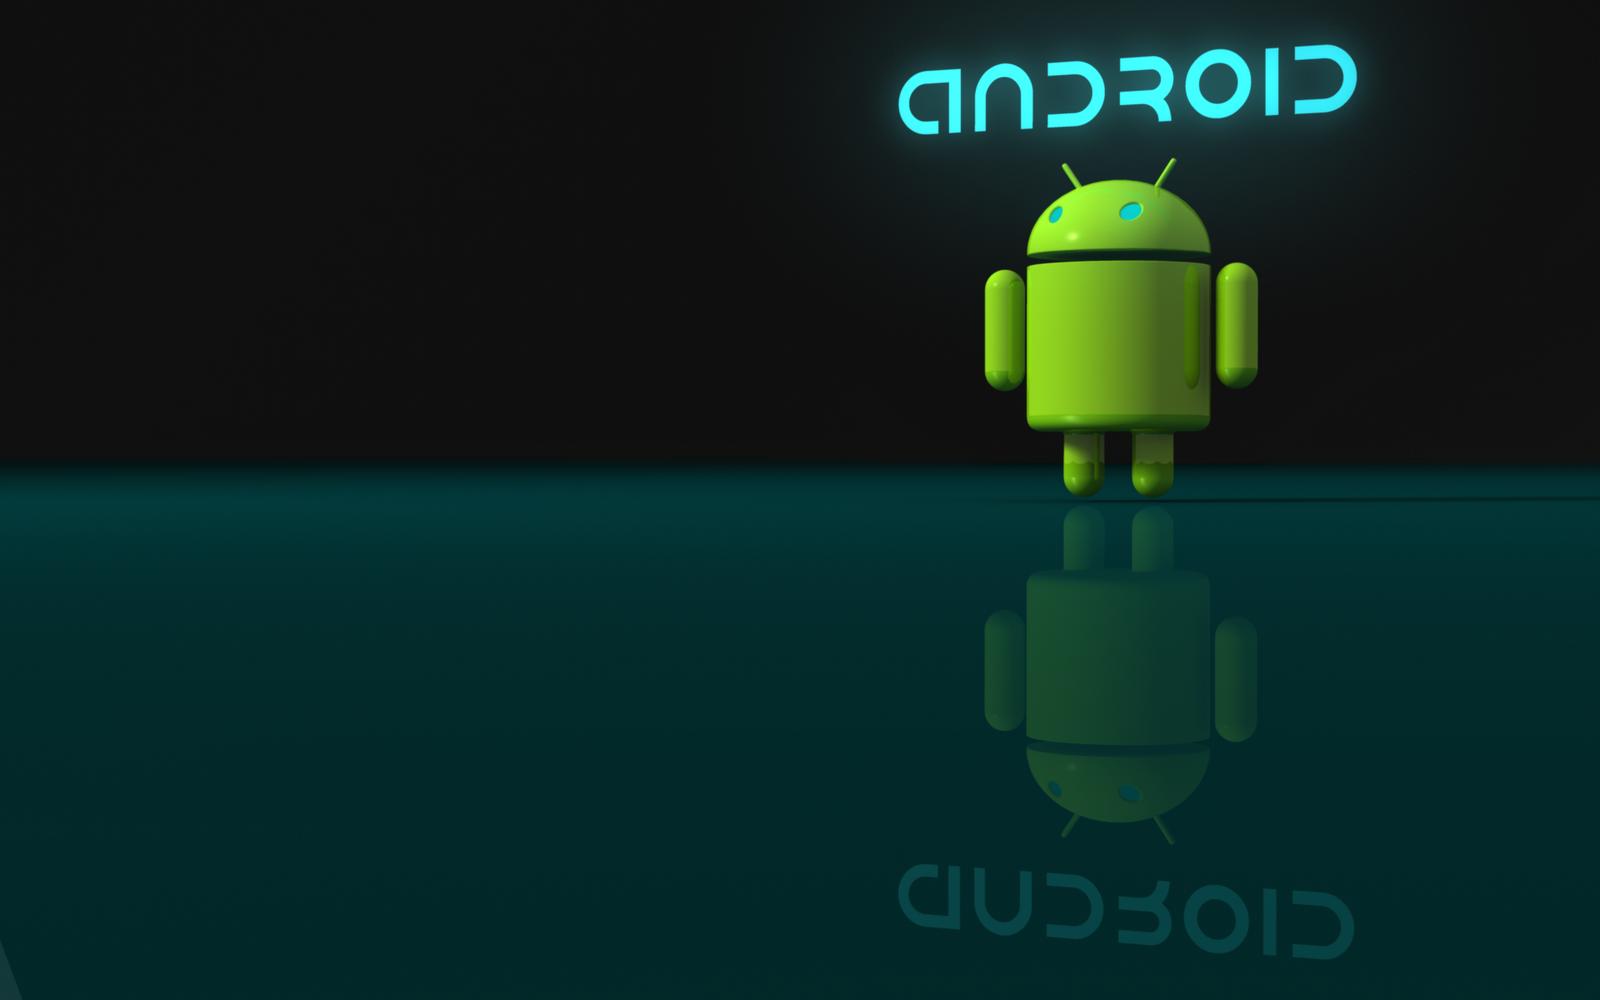 http://1.bp.blogspot.com/-sKc7wMKP1tw/TZZufCgZQQI/AAAAAAAAAuE/aNrB0O-cZdw/s1600/Android-Dark-Blue-Wallpaper.jpg